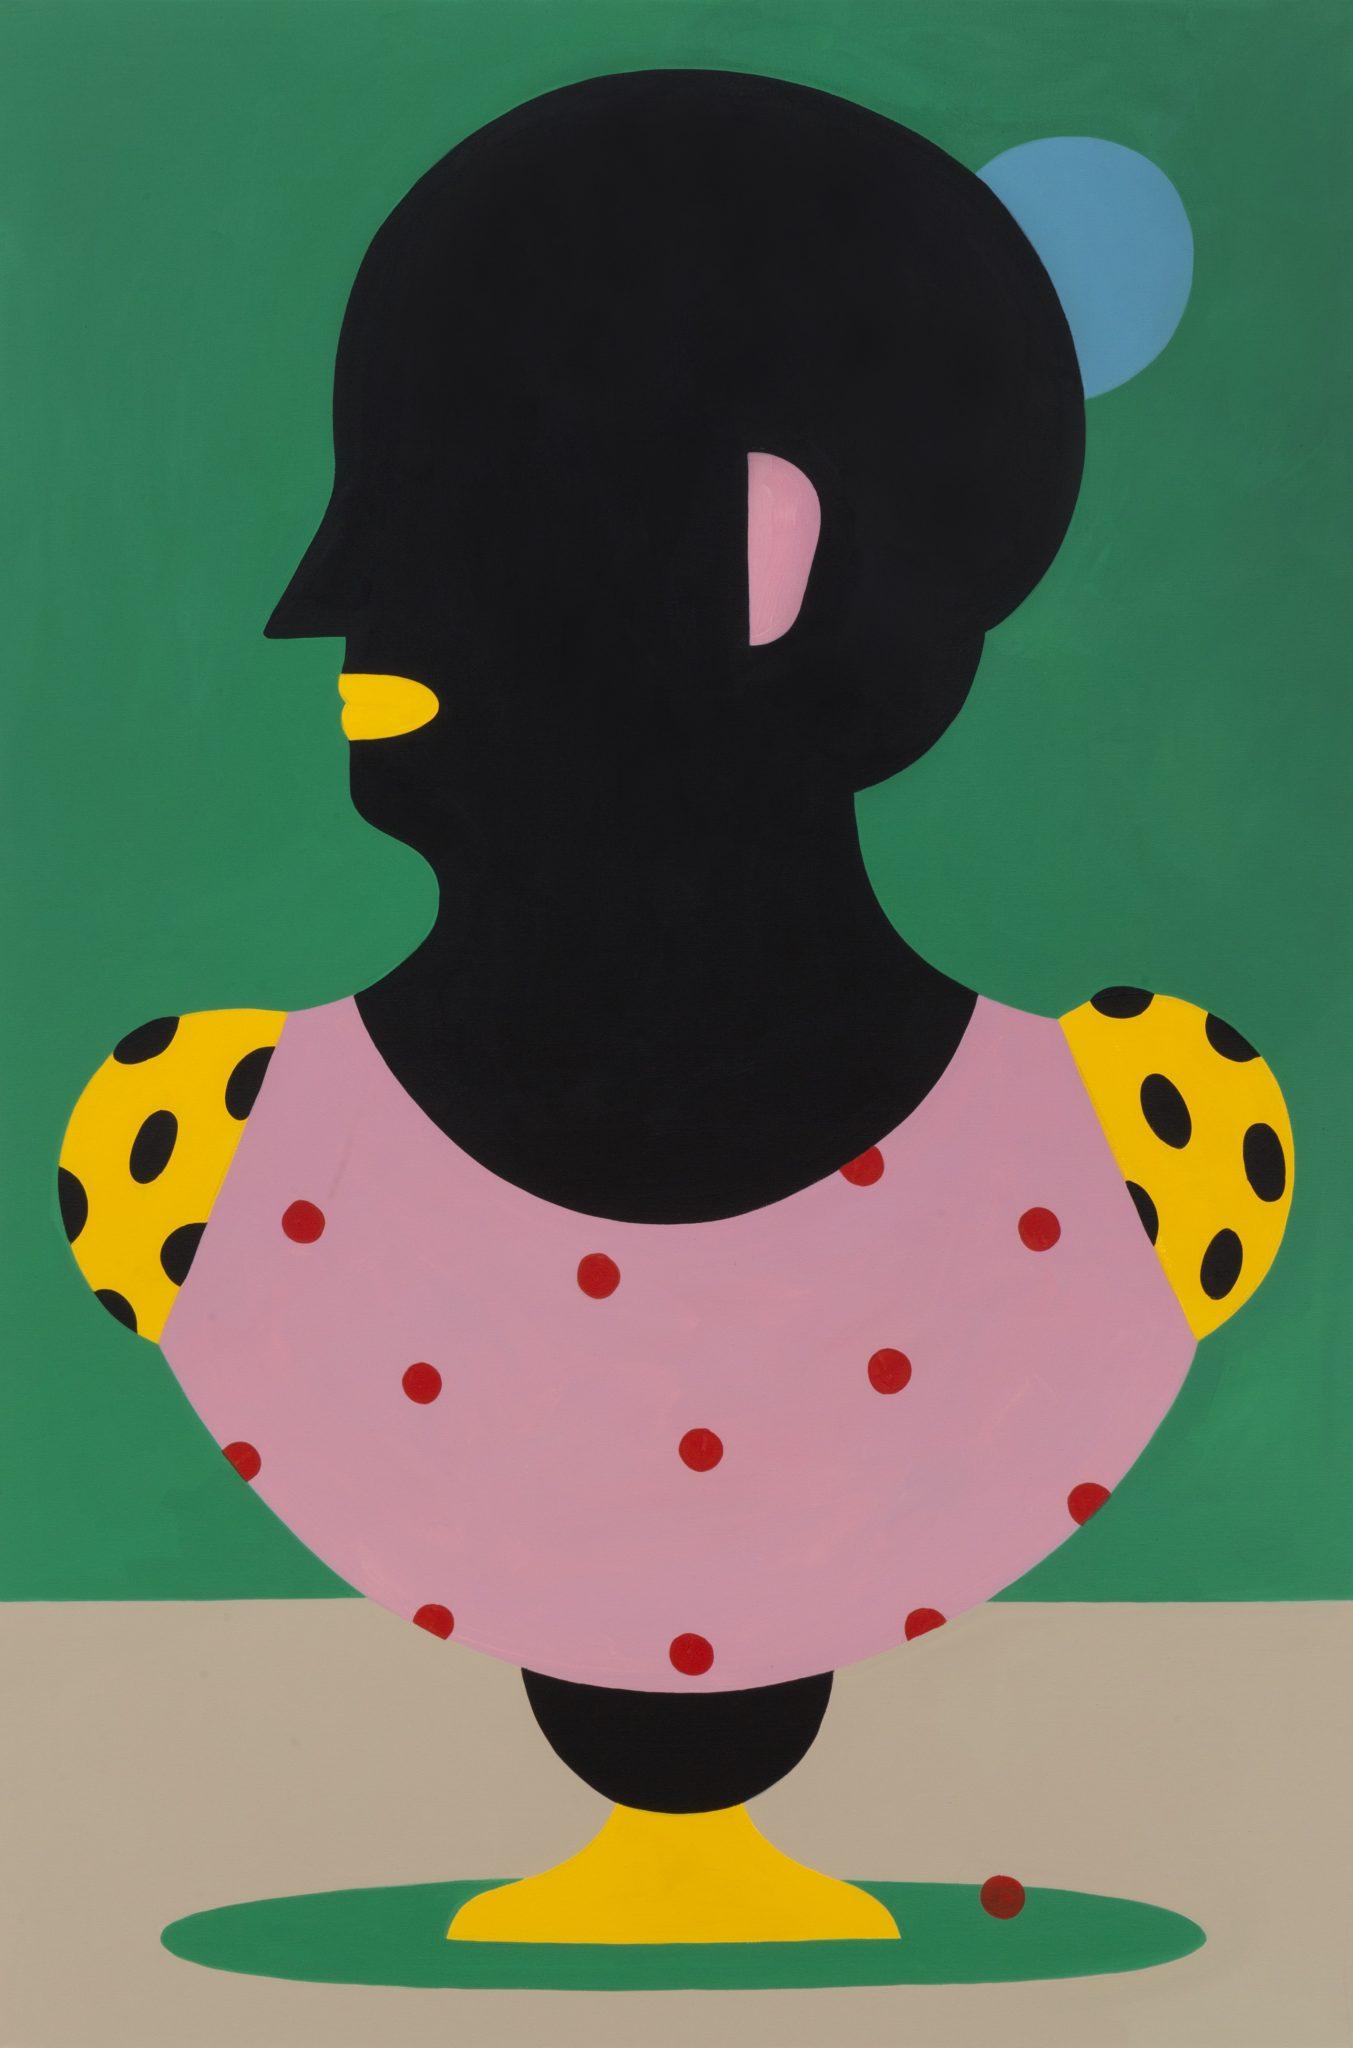 Agostino Iacurci, Bust n°3, 2018, acrilico su tela, cm 150x100 | Photo: Lorenzo Palmieri, Courtesy: M77 Gallery